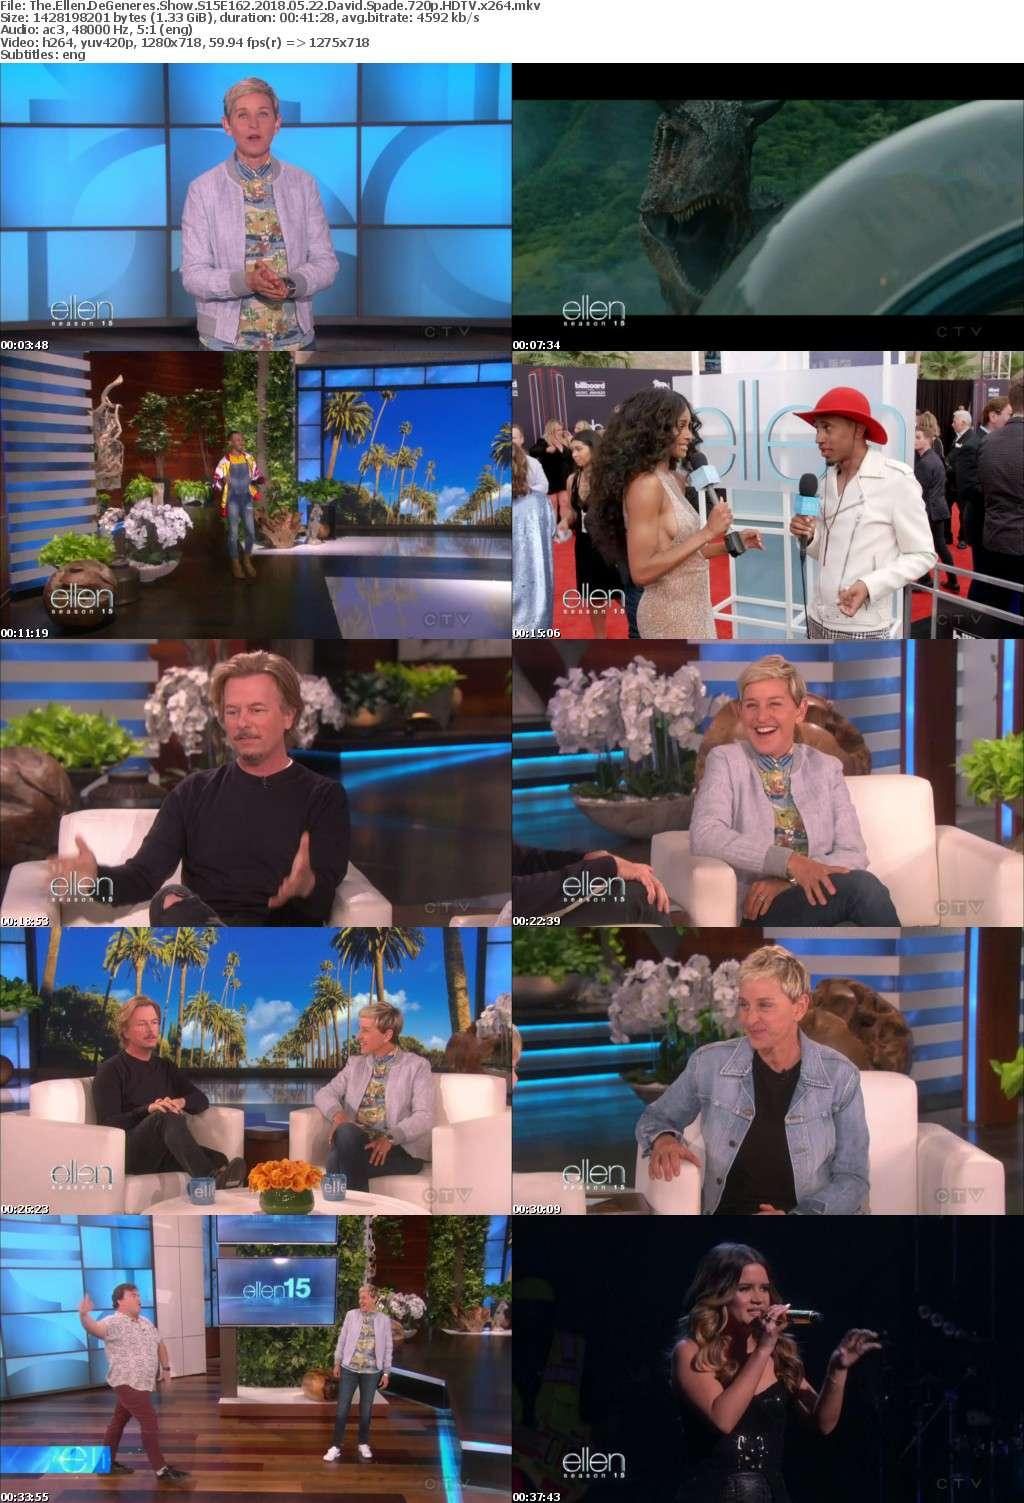 The Ellen DeGeneres Show S15E162 2018 05 22 David Spade 720p HDTV x264